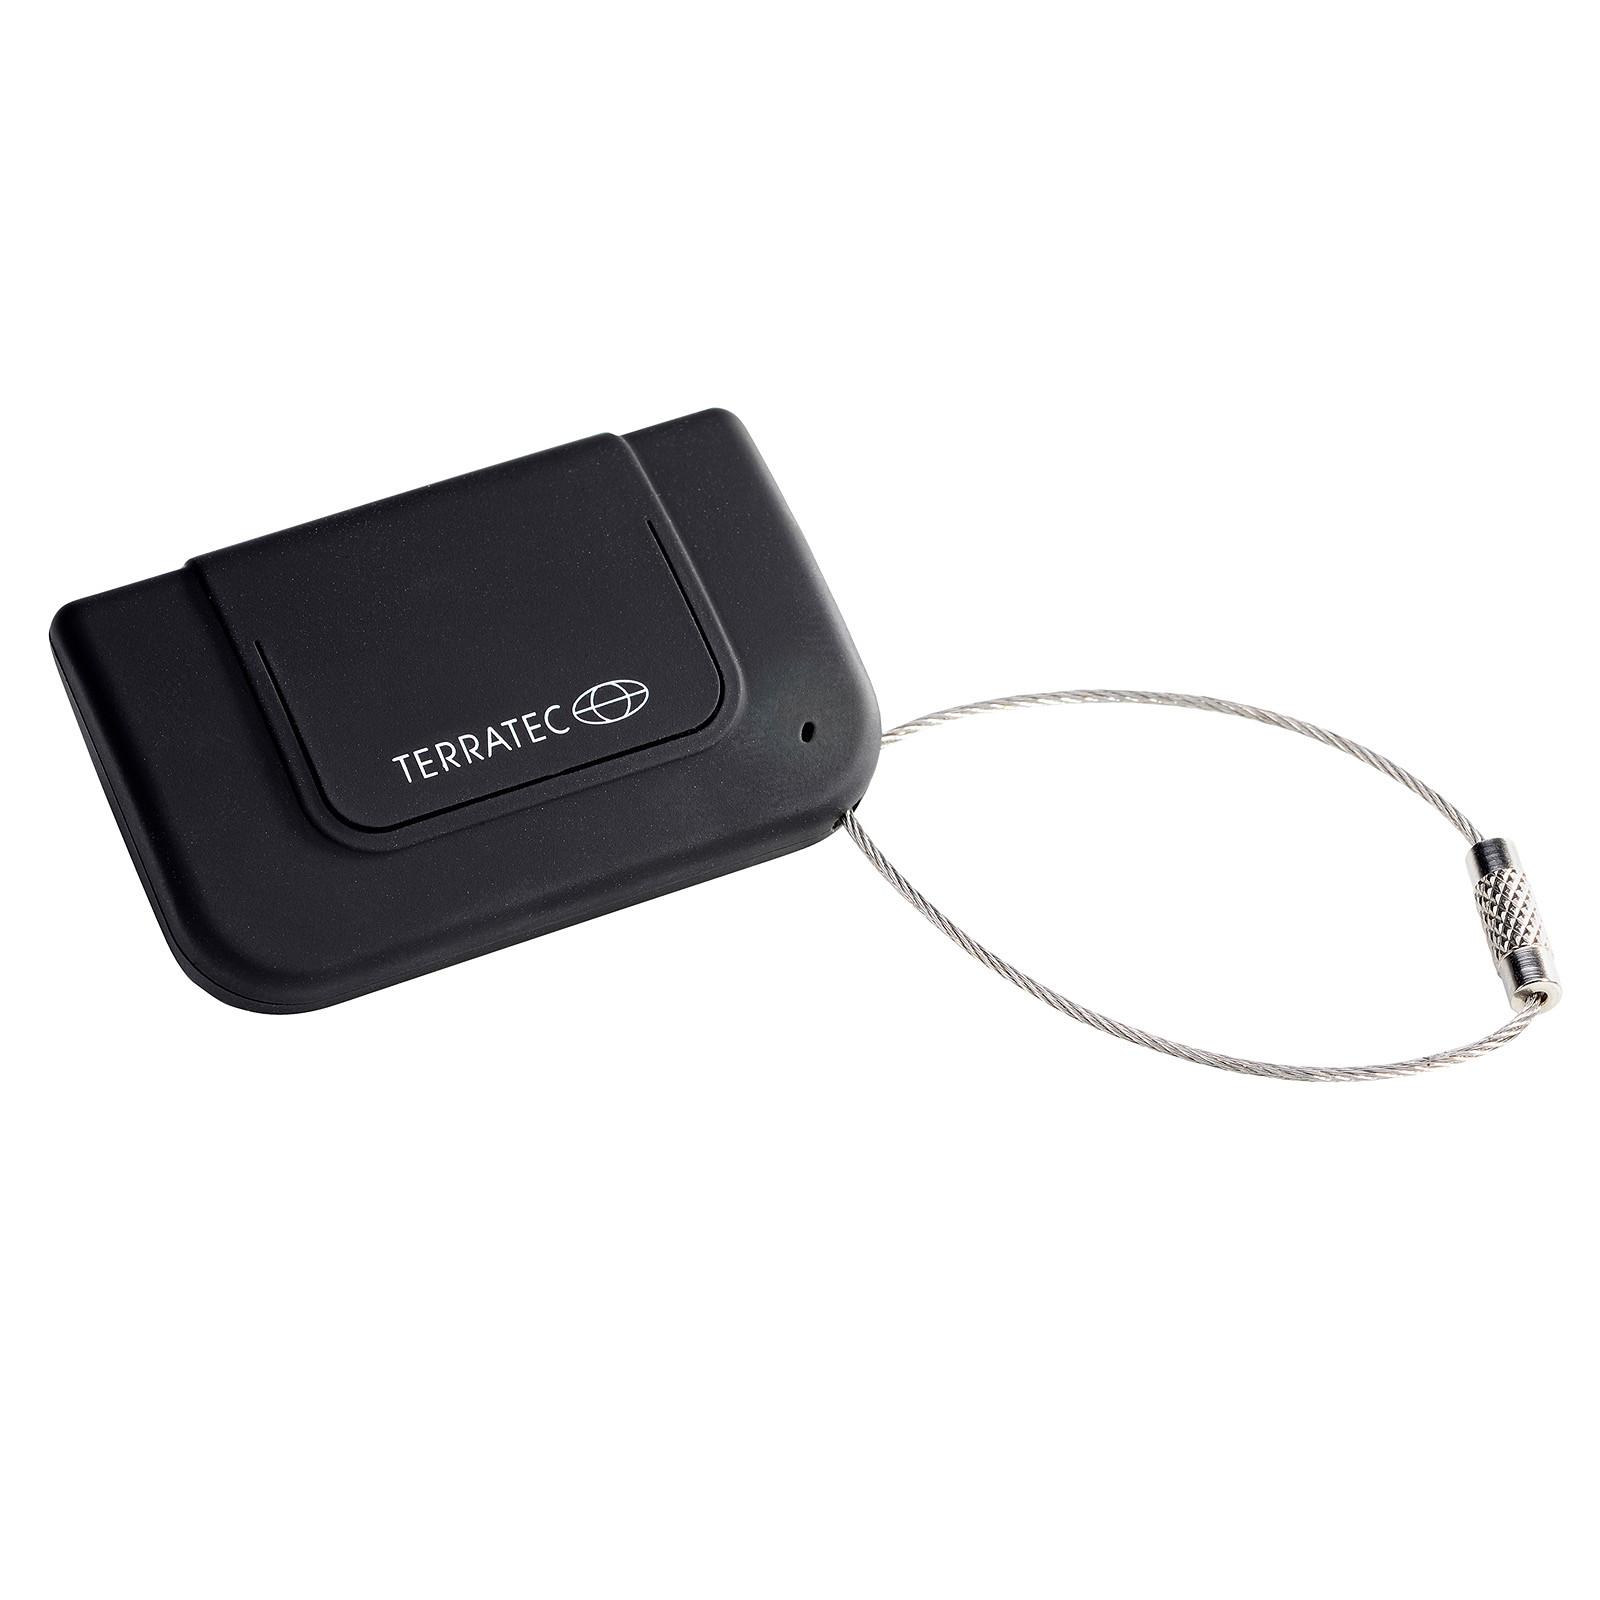 Terratec Protect Mobile